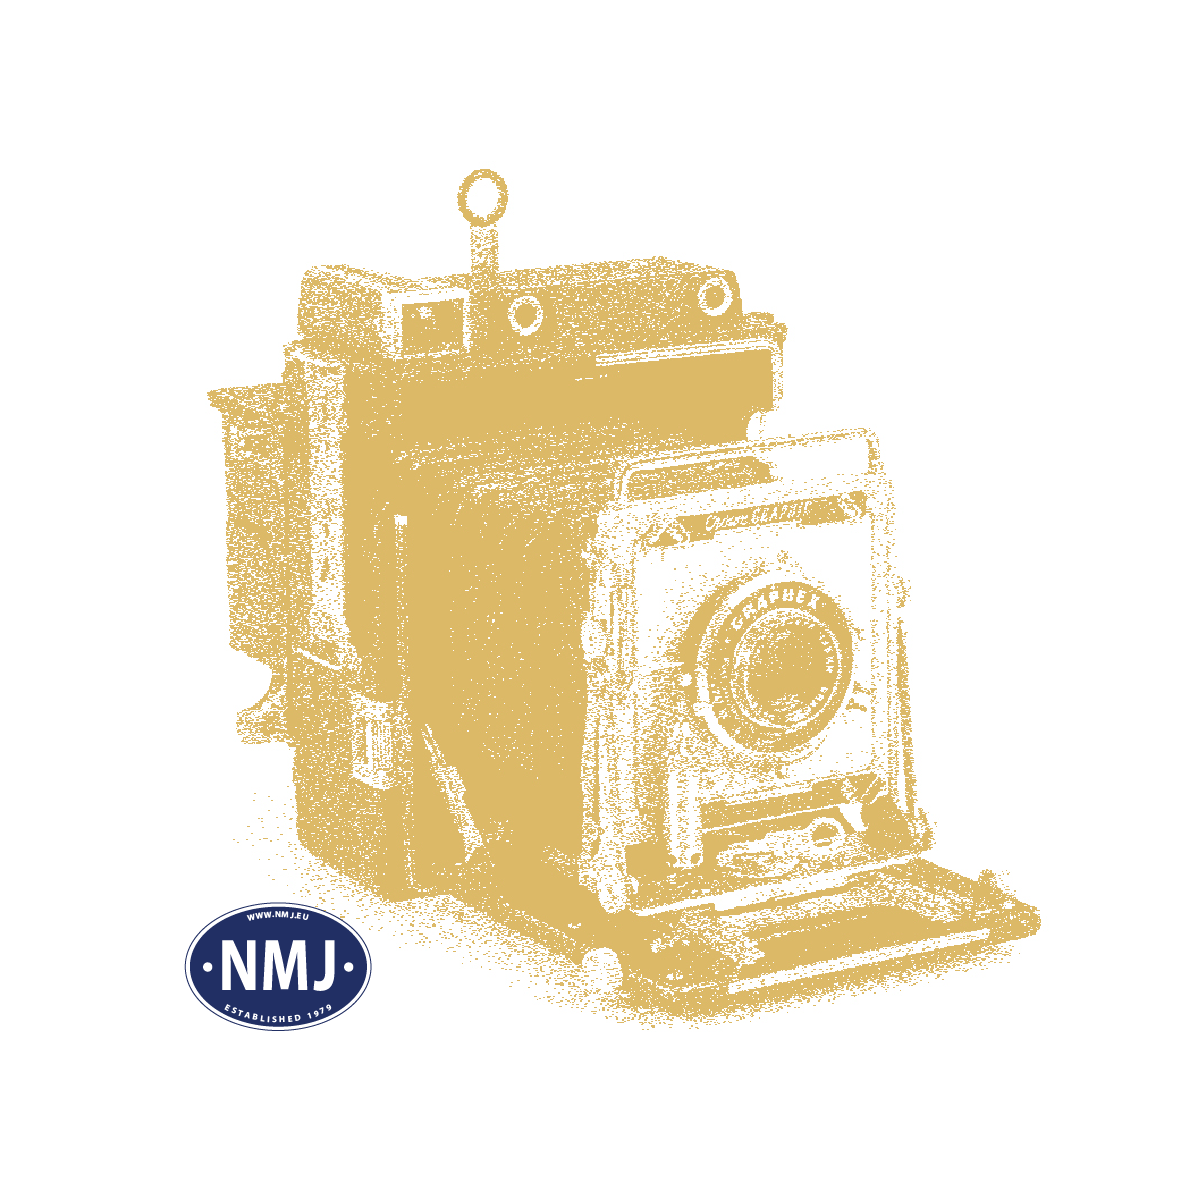 "NMJT506.304 - NMJ Topline NSB Gbs 150 0 214-4 ""Adresseavisen"""